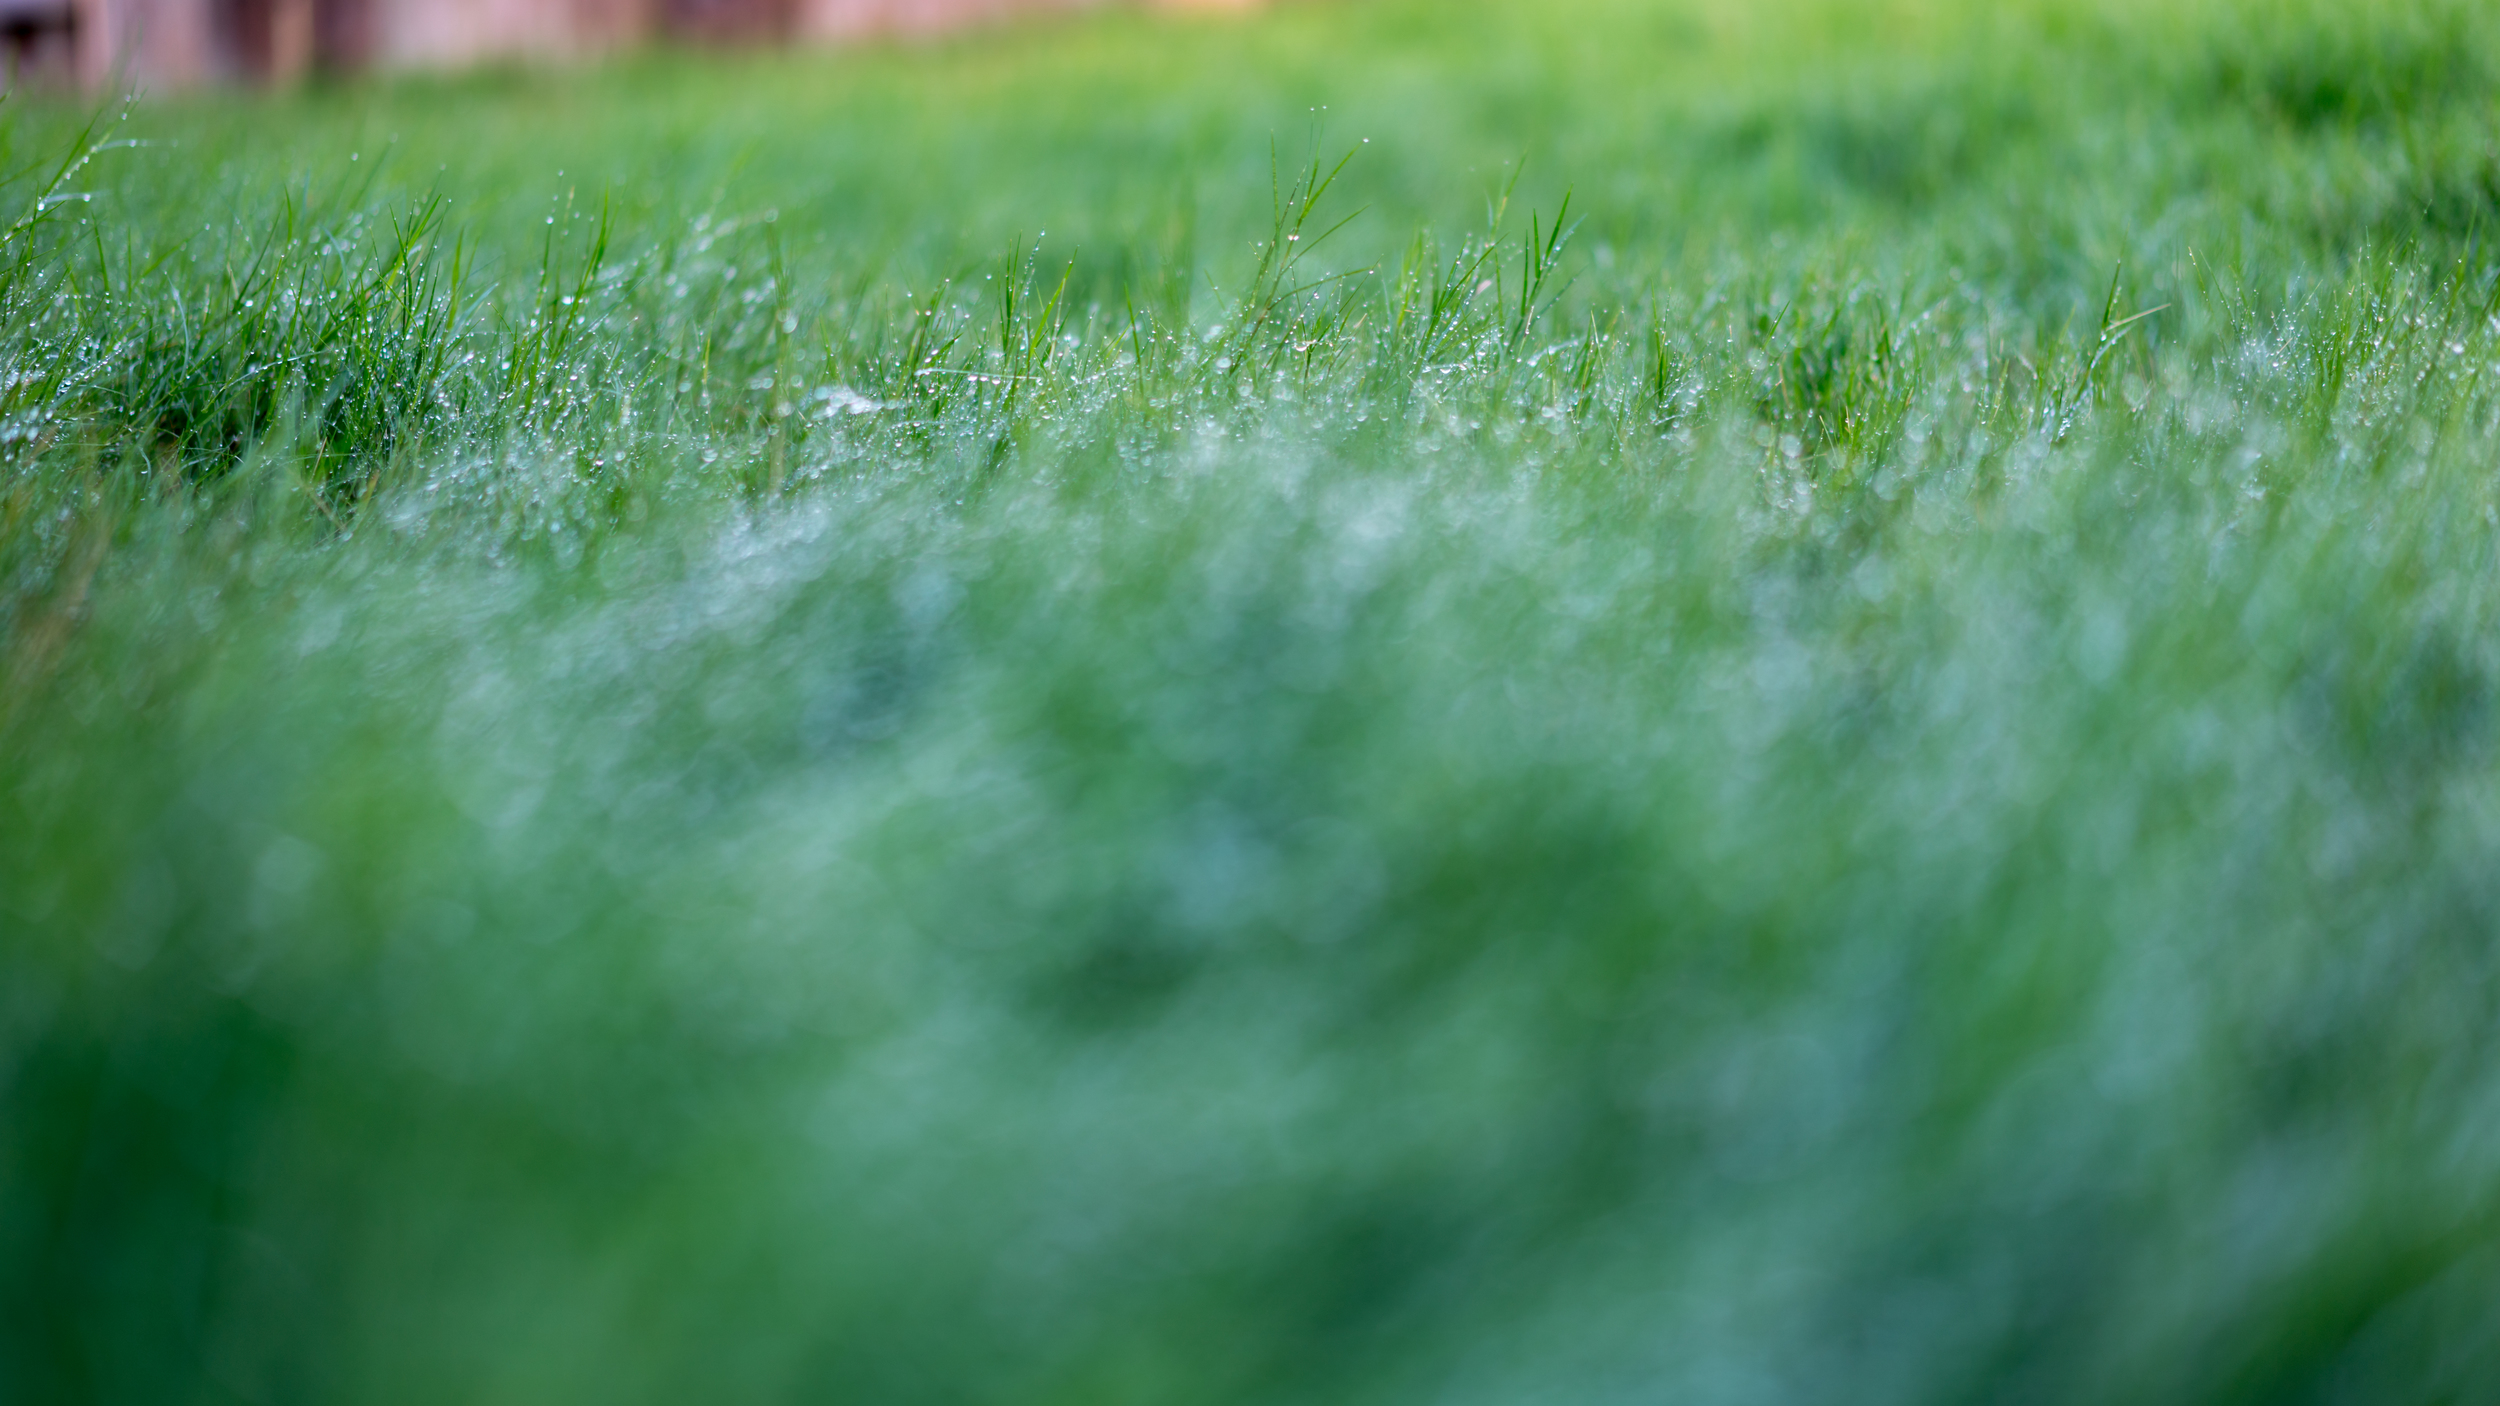 dewy grass-10.jpg